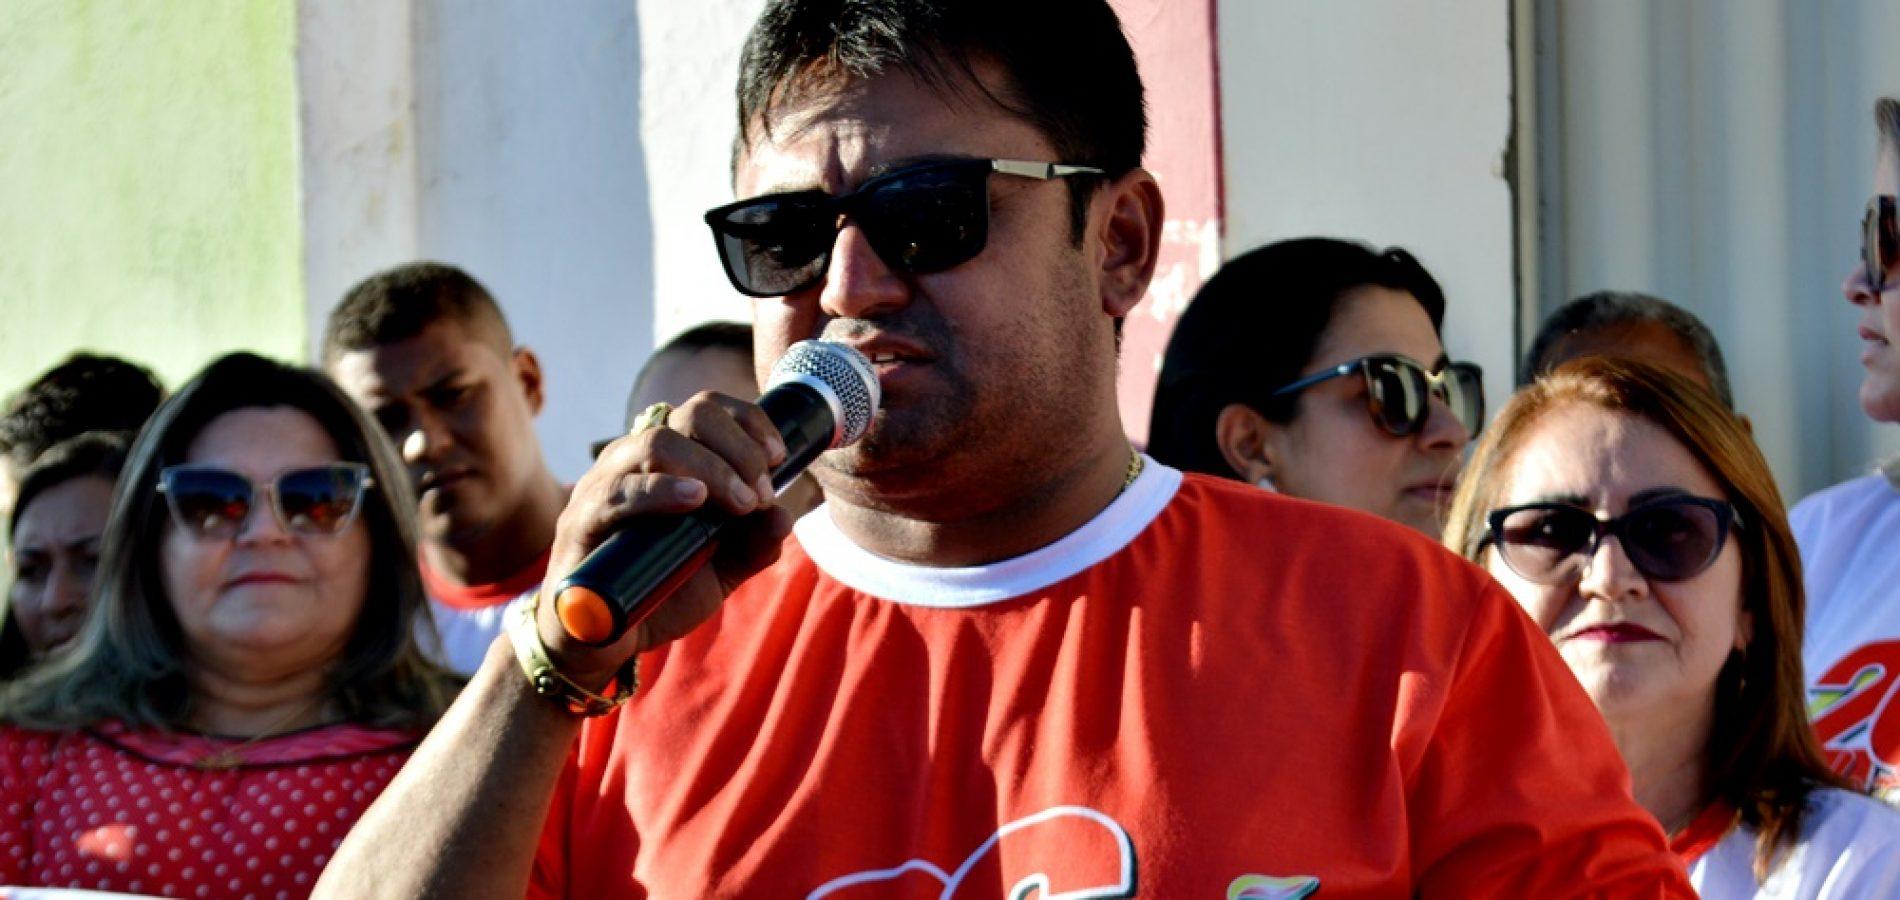 ALEGRETE | Tribunal aprova por unanimidade contas de 2016 do prefeito Márcio Alencar